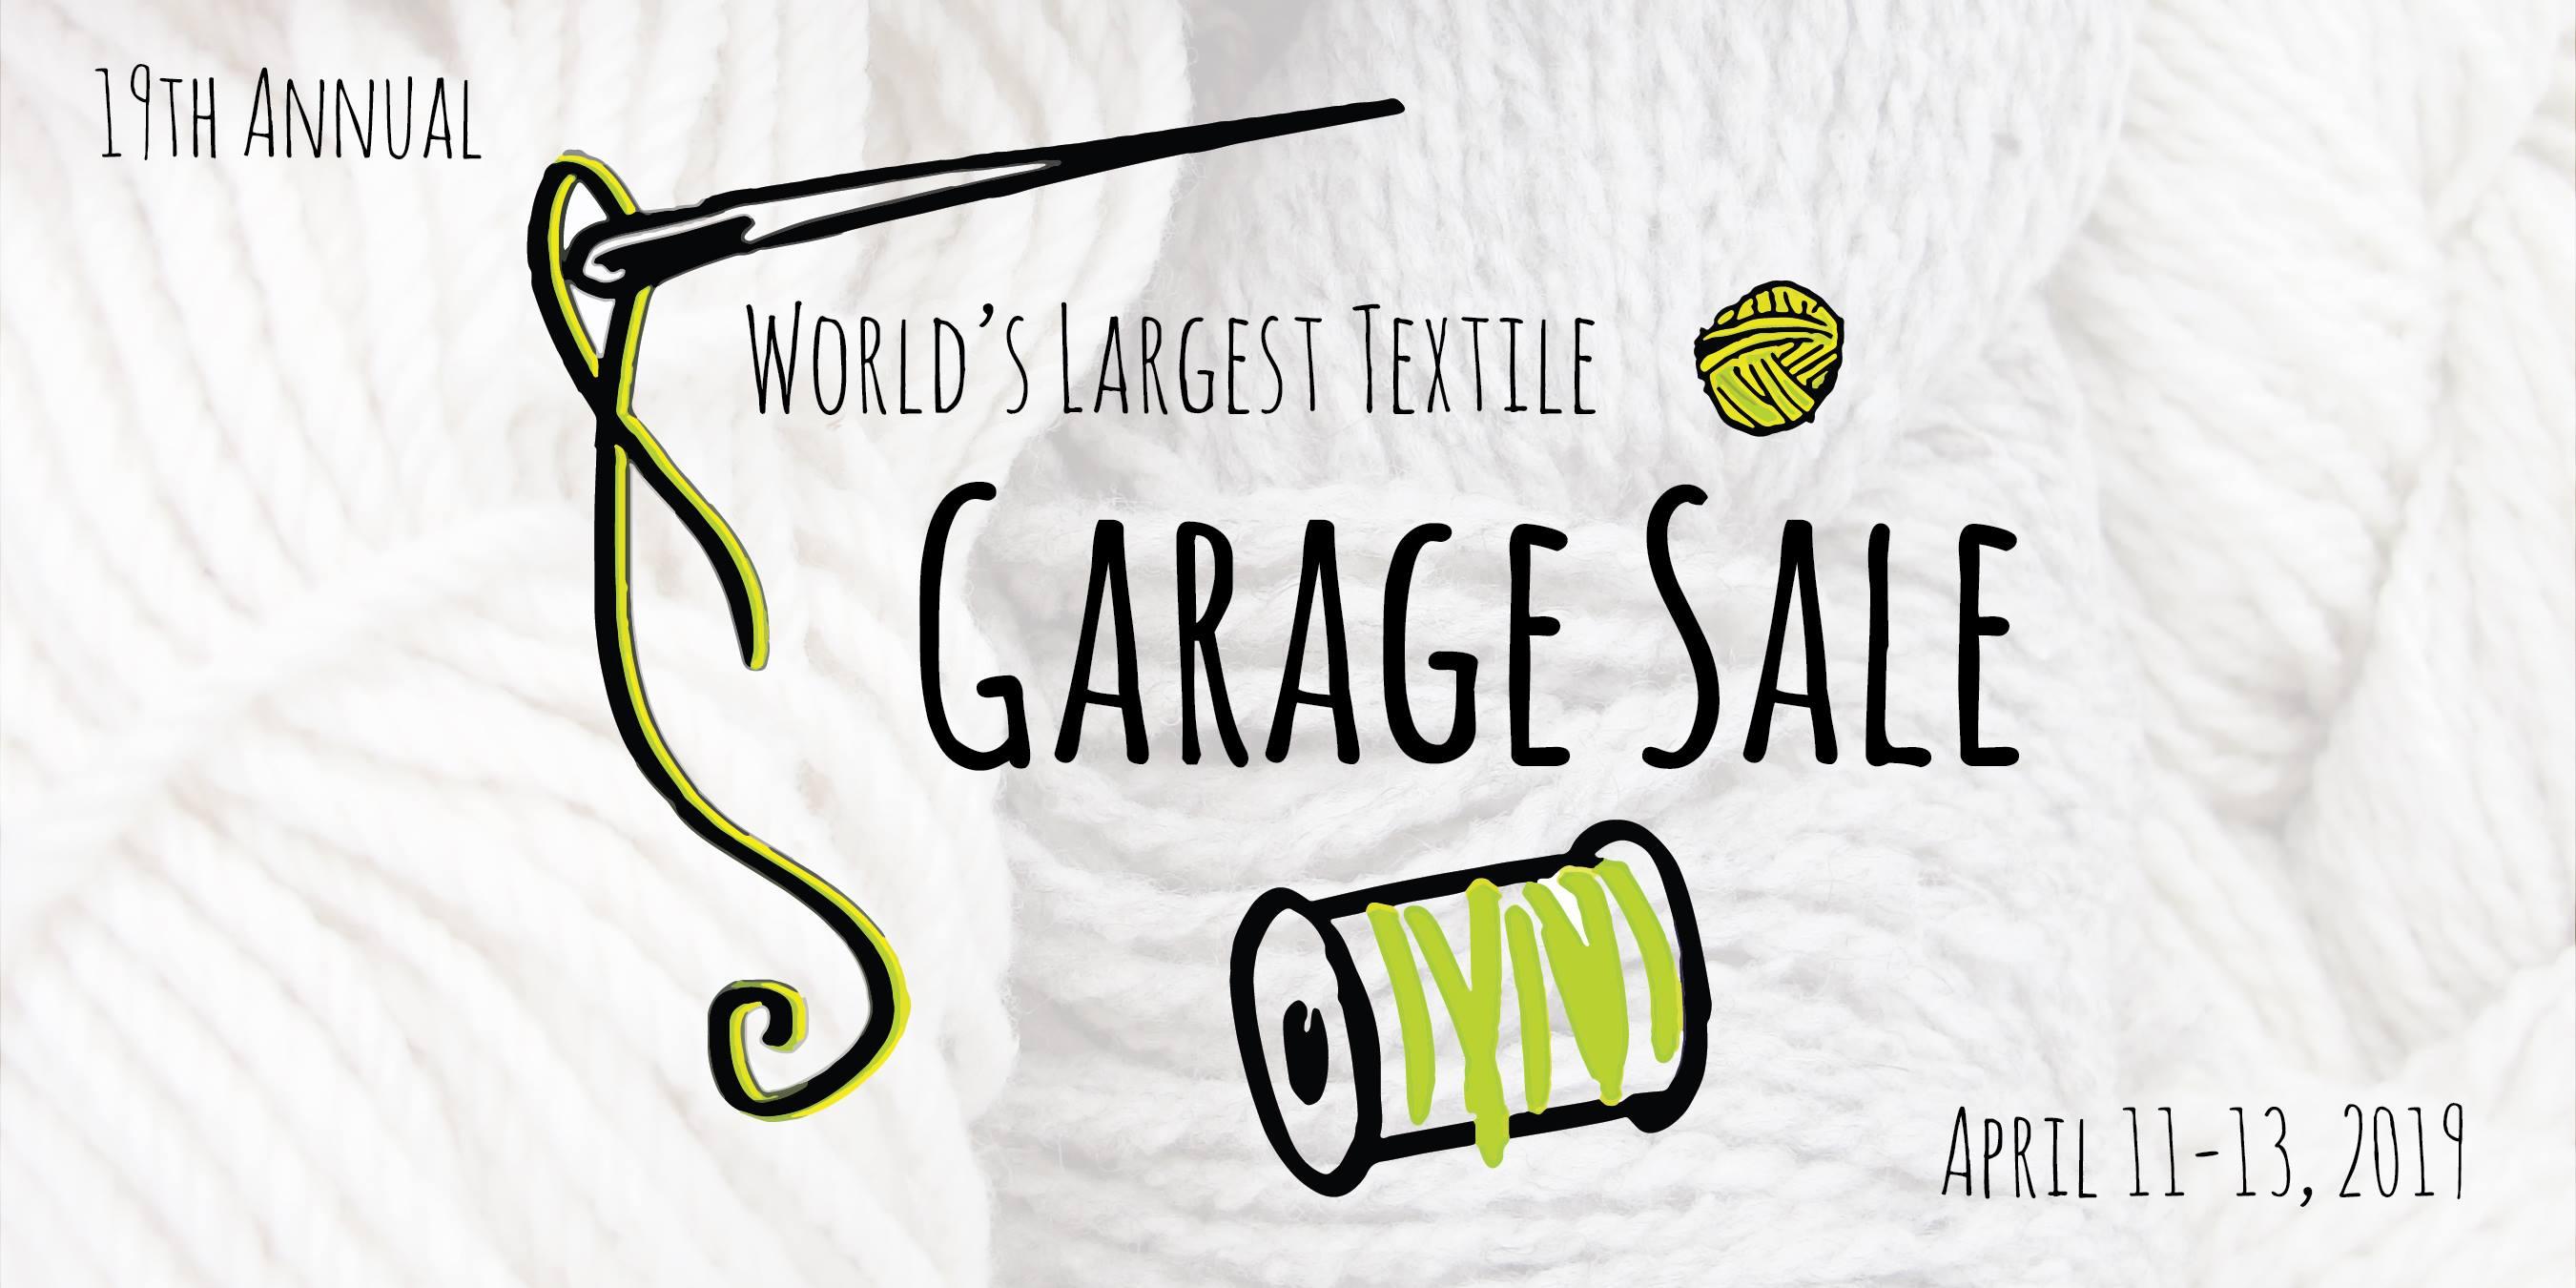 Textile Center's Textile Garage Sale - Thrifty Minnesota